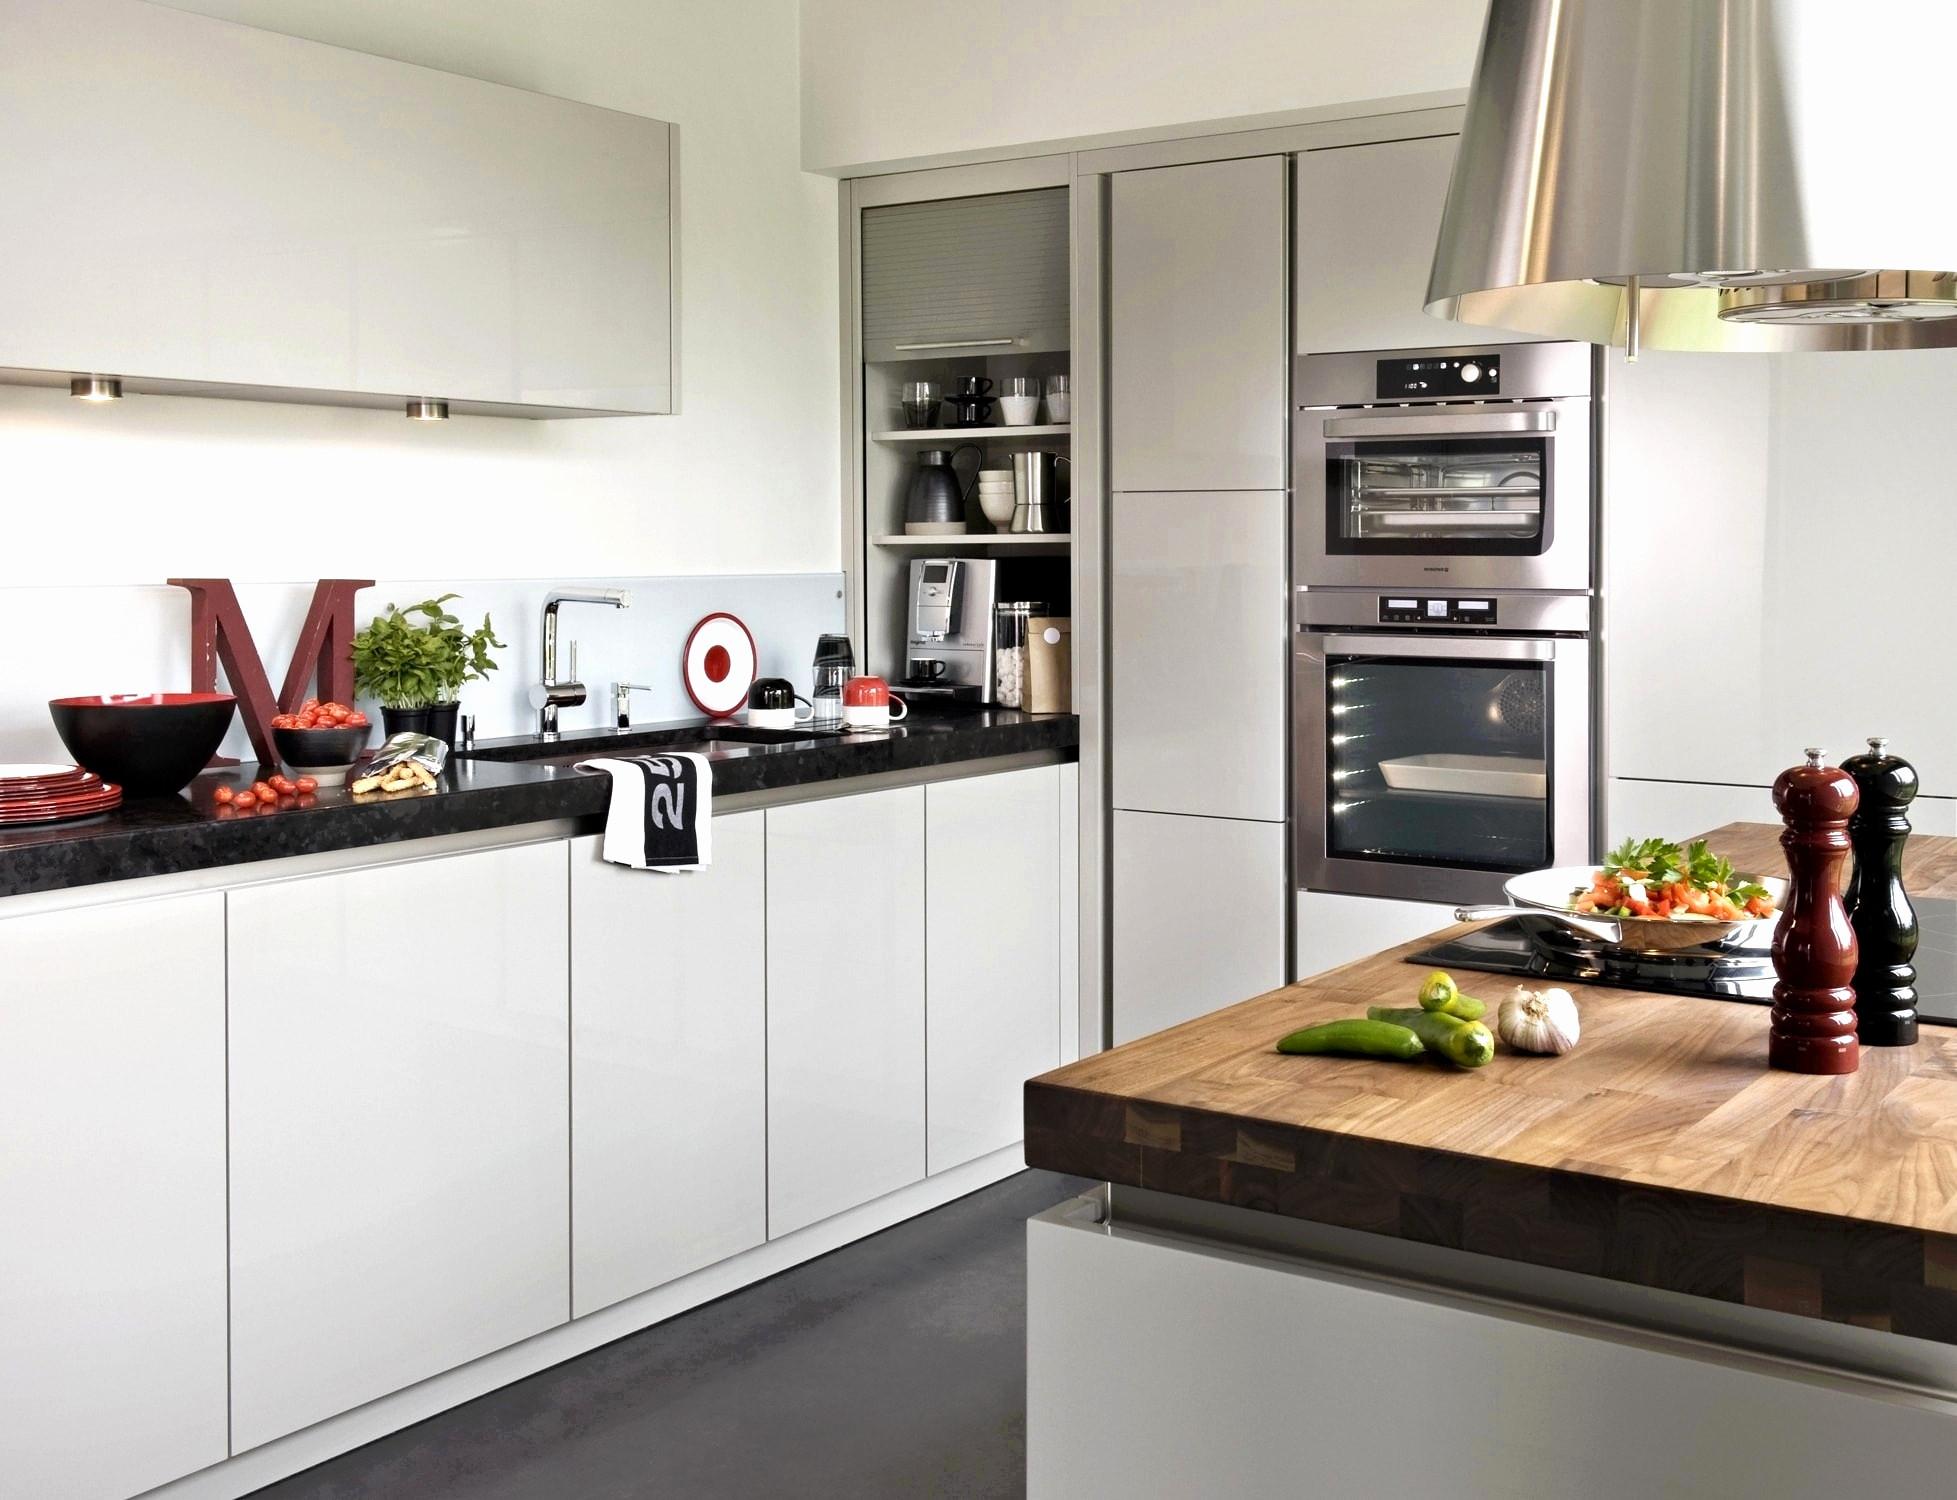 Ikea Cuisine Ilot Inspirant Image Ilot Central Bar Cuisine Ilot Bar Cuisine Beau Ilot Centrale